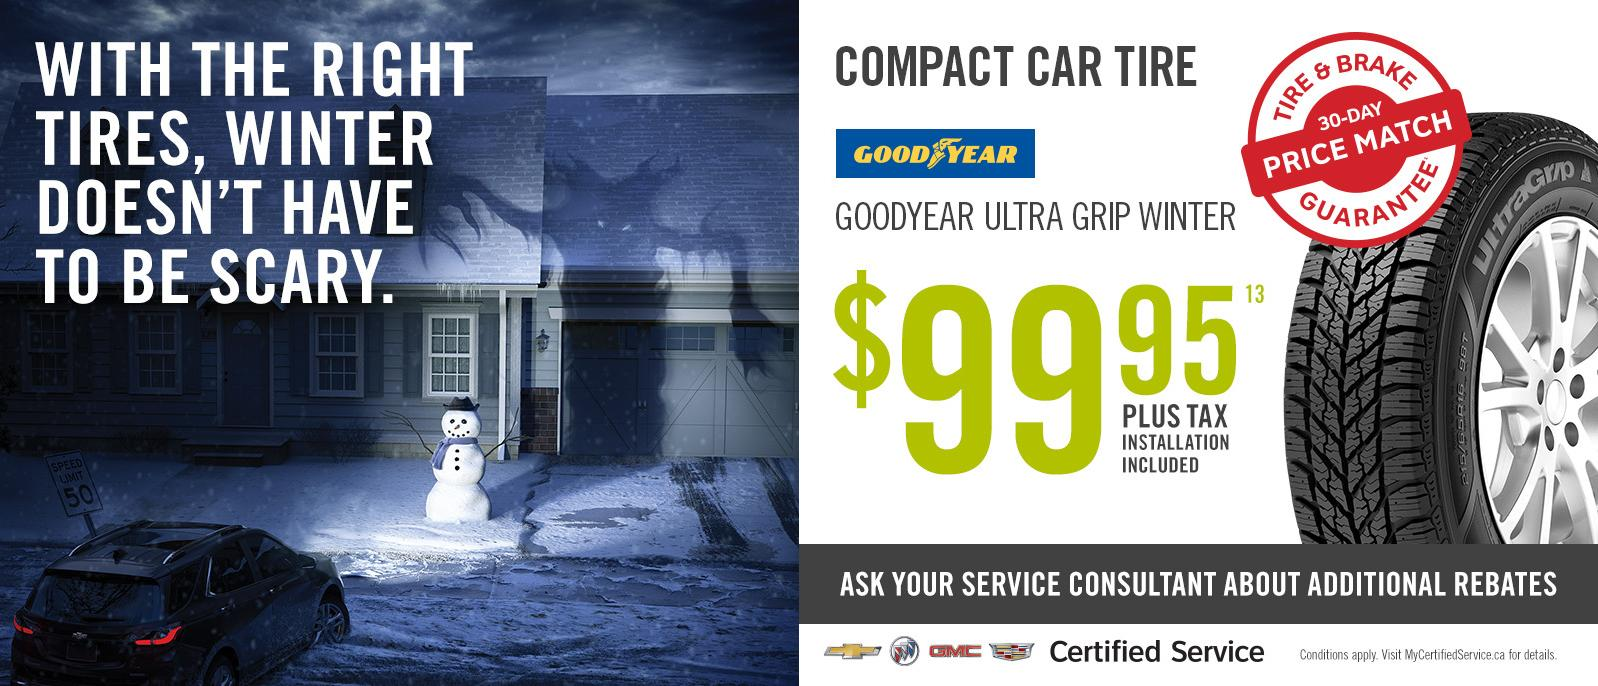 Winter Tire Special Deal Goodyear from $99.95 VanDusen Ajax Ontario